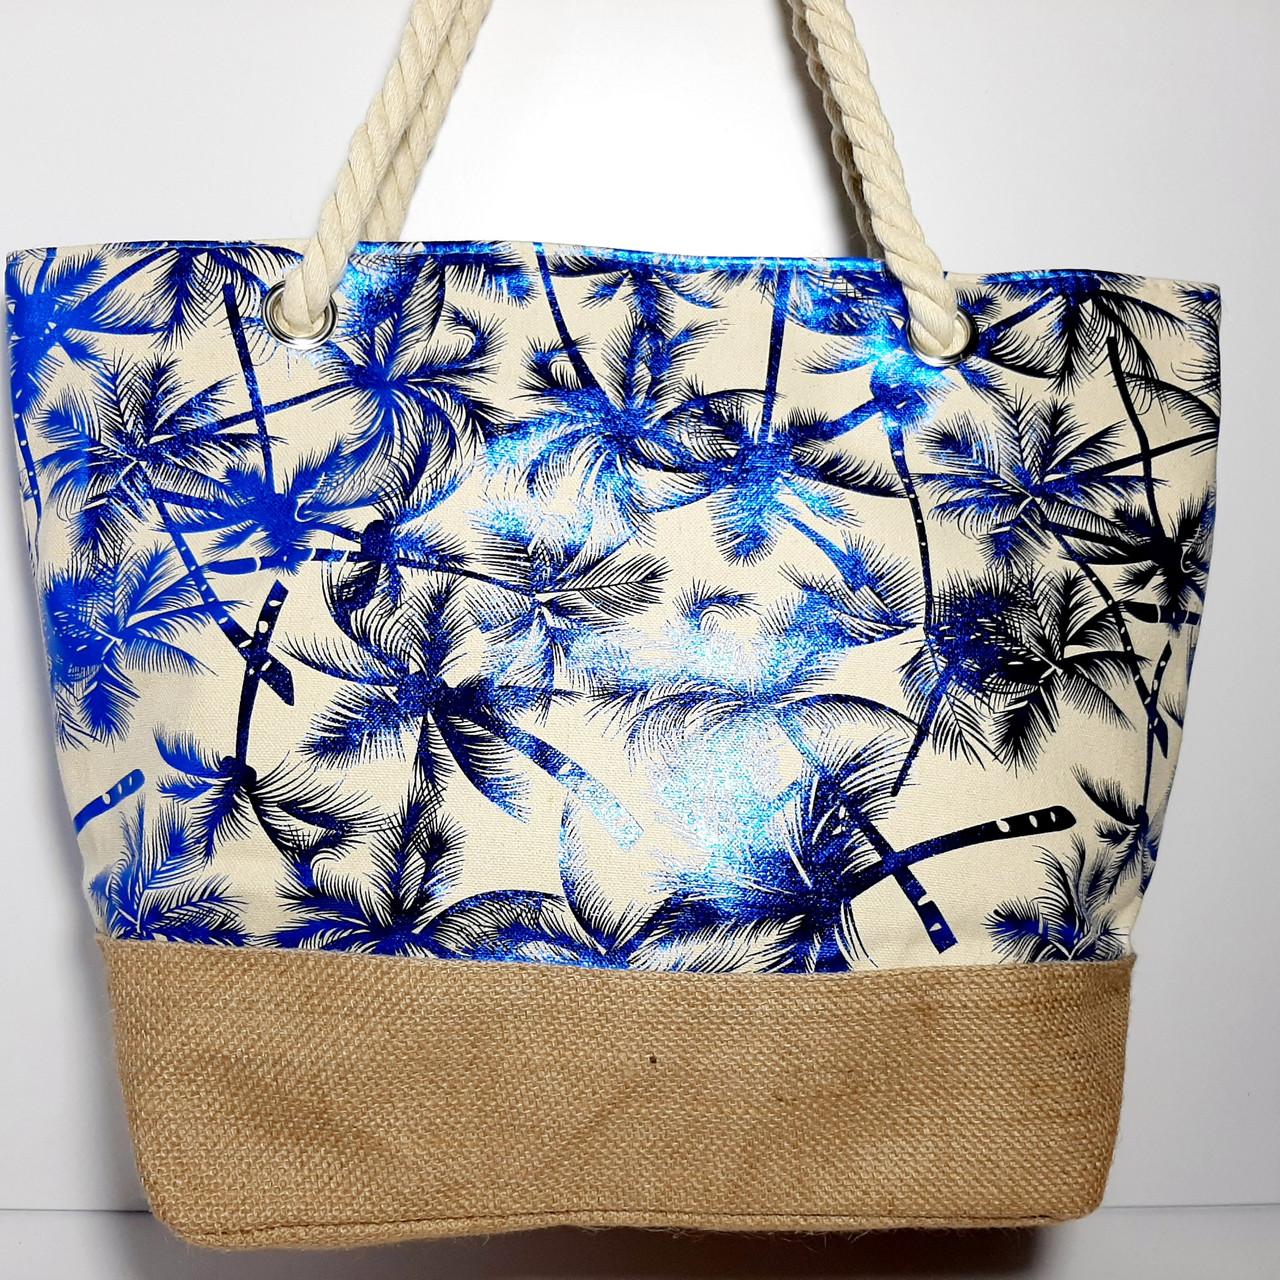 Пляжная текстильная летняя сумка